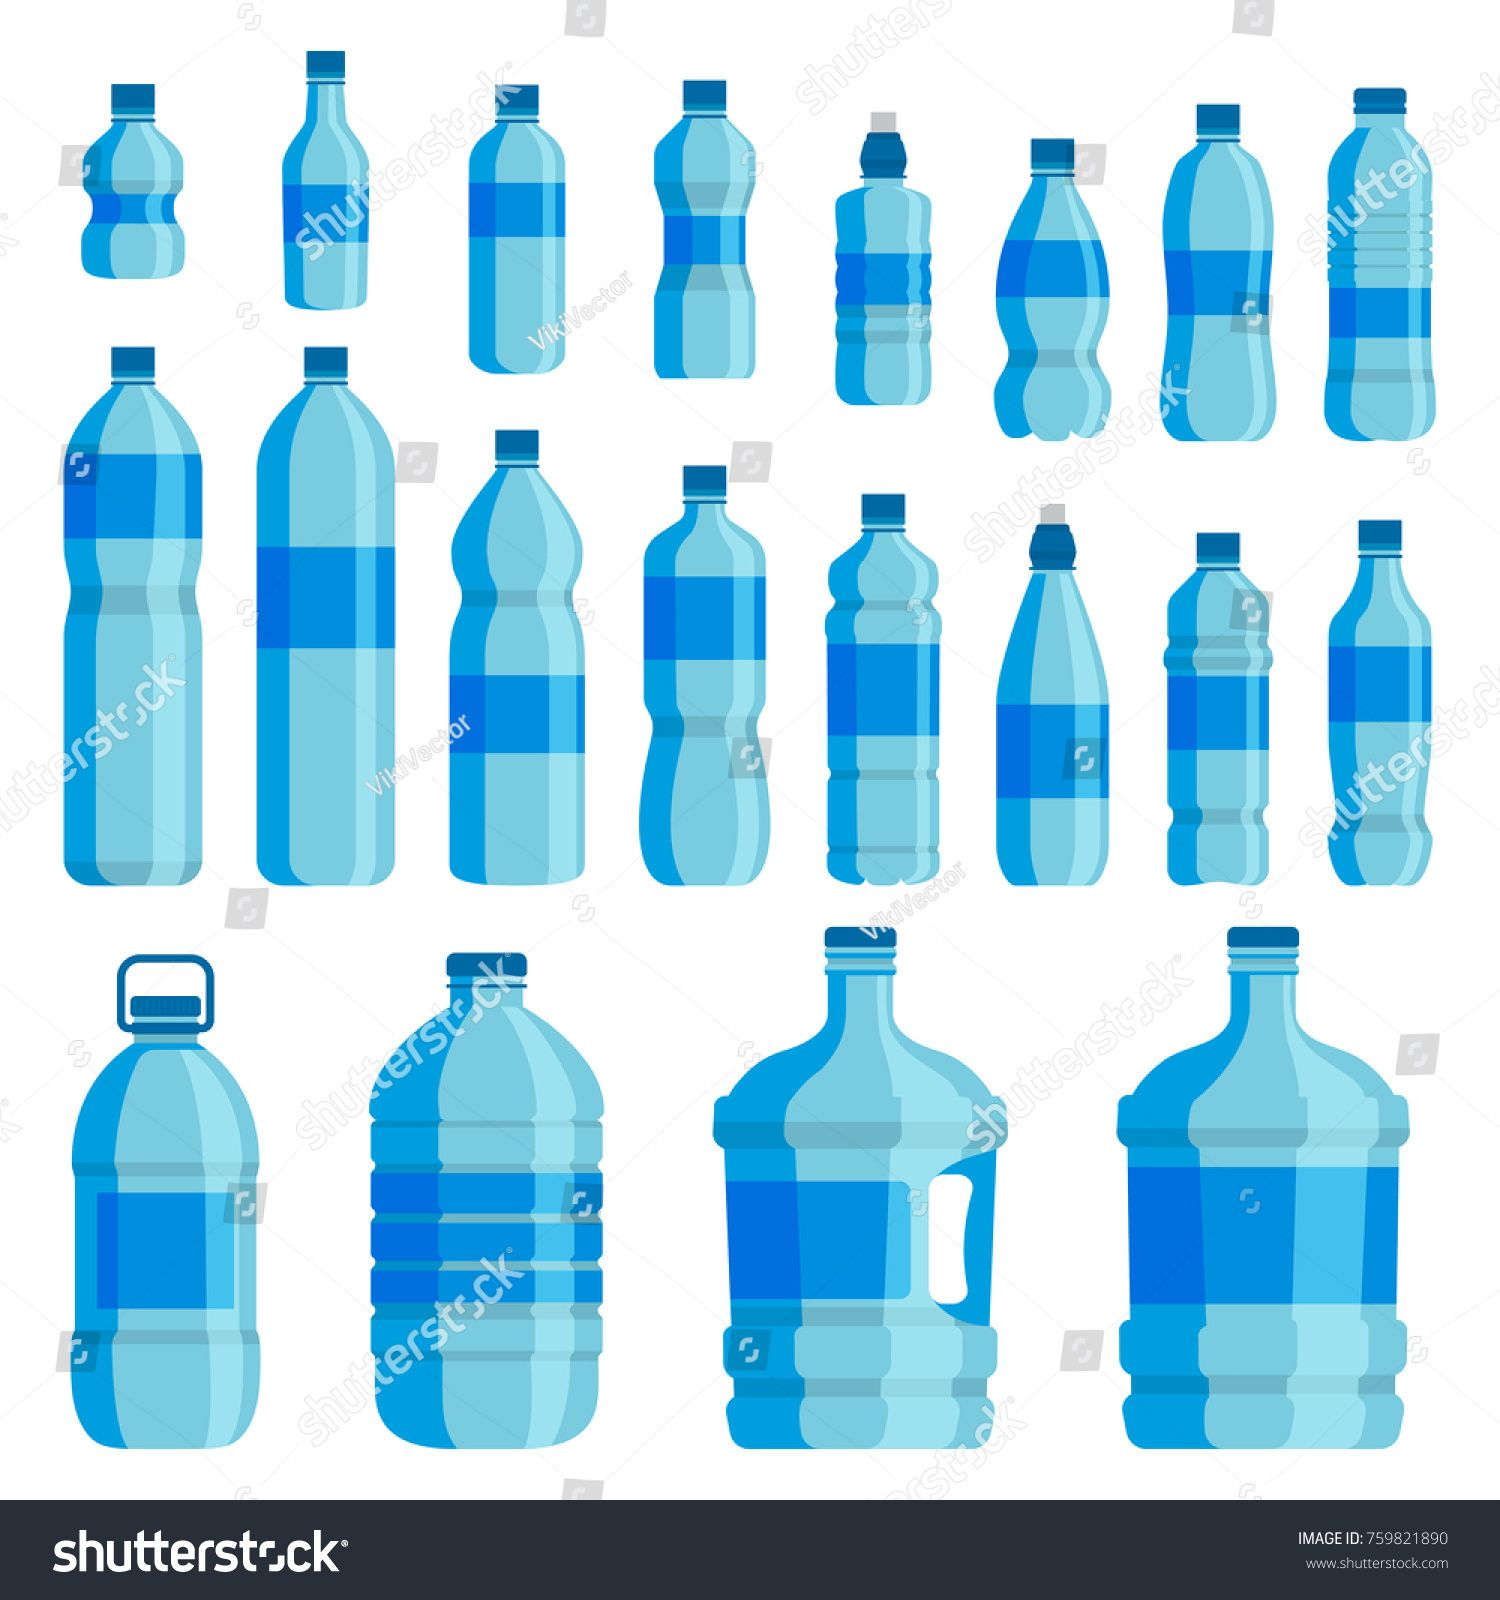 Plastic Bottle Water Set Blue Drinking Water Packaged In Pet Bottle Recyclable And Easy To Store Liquids Vector Flat Sty In 2021 Bottle Water Bottle Plastic Bottles